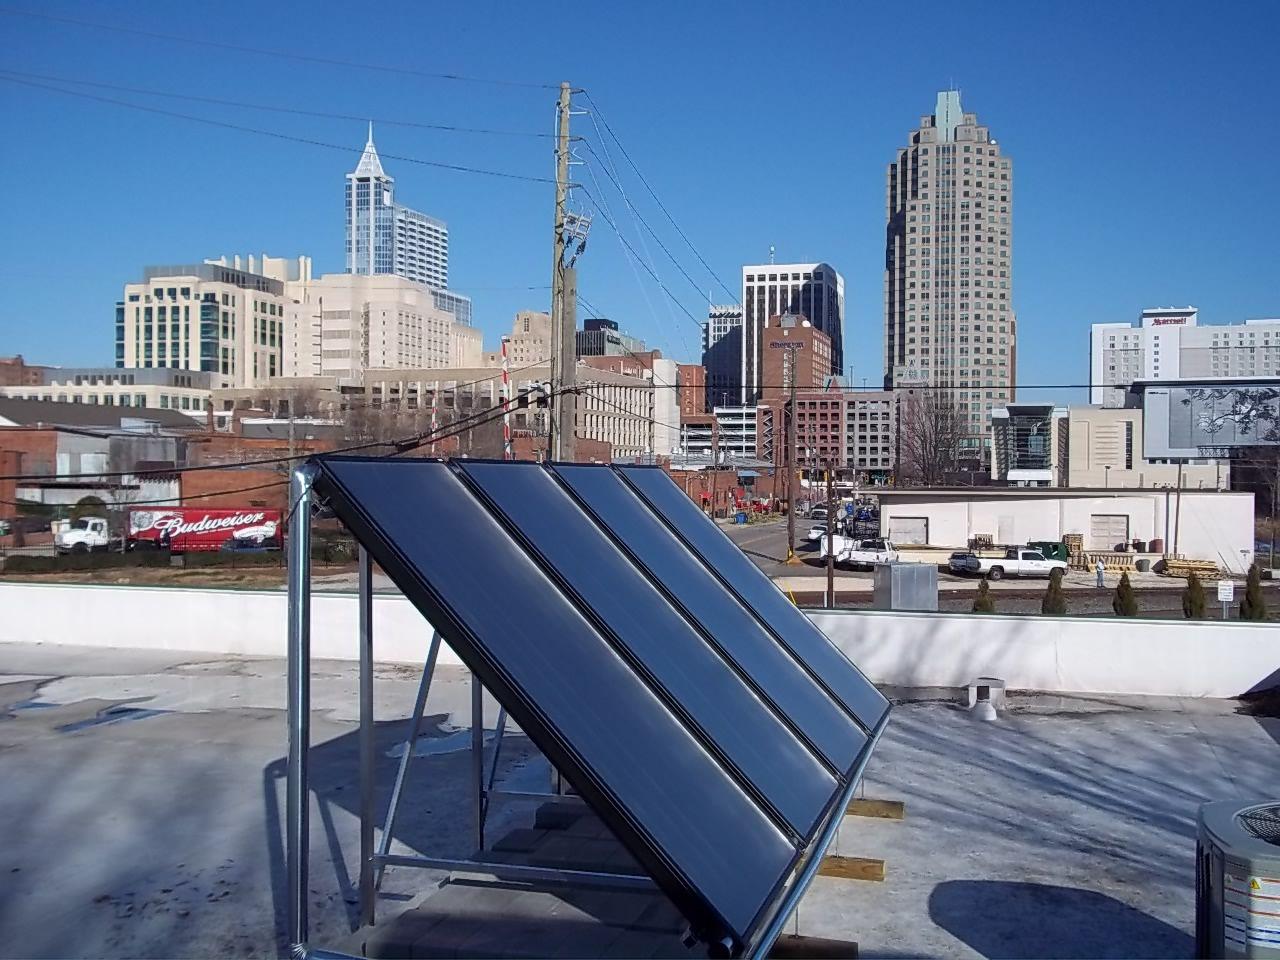 Solar rooftop donation program ncwarn says were